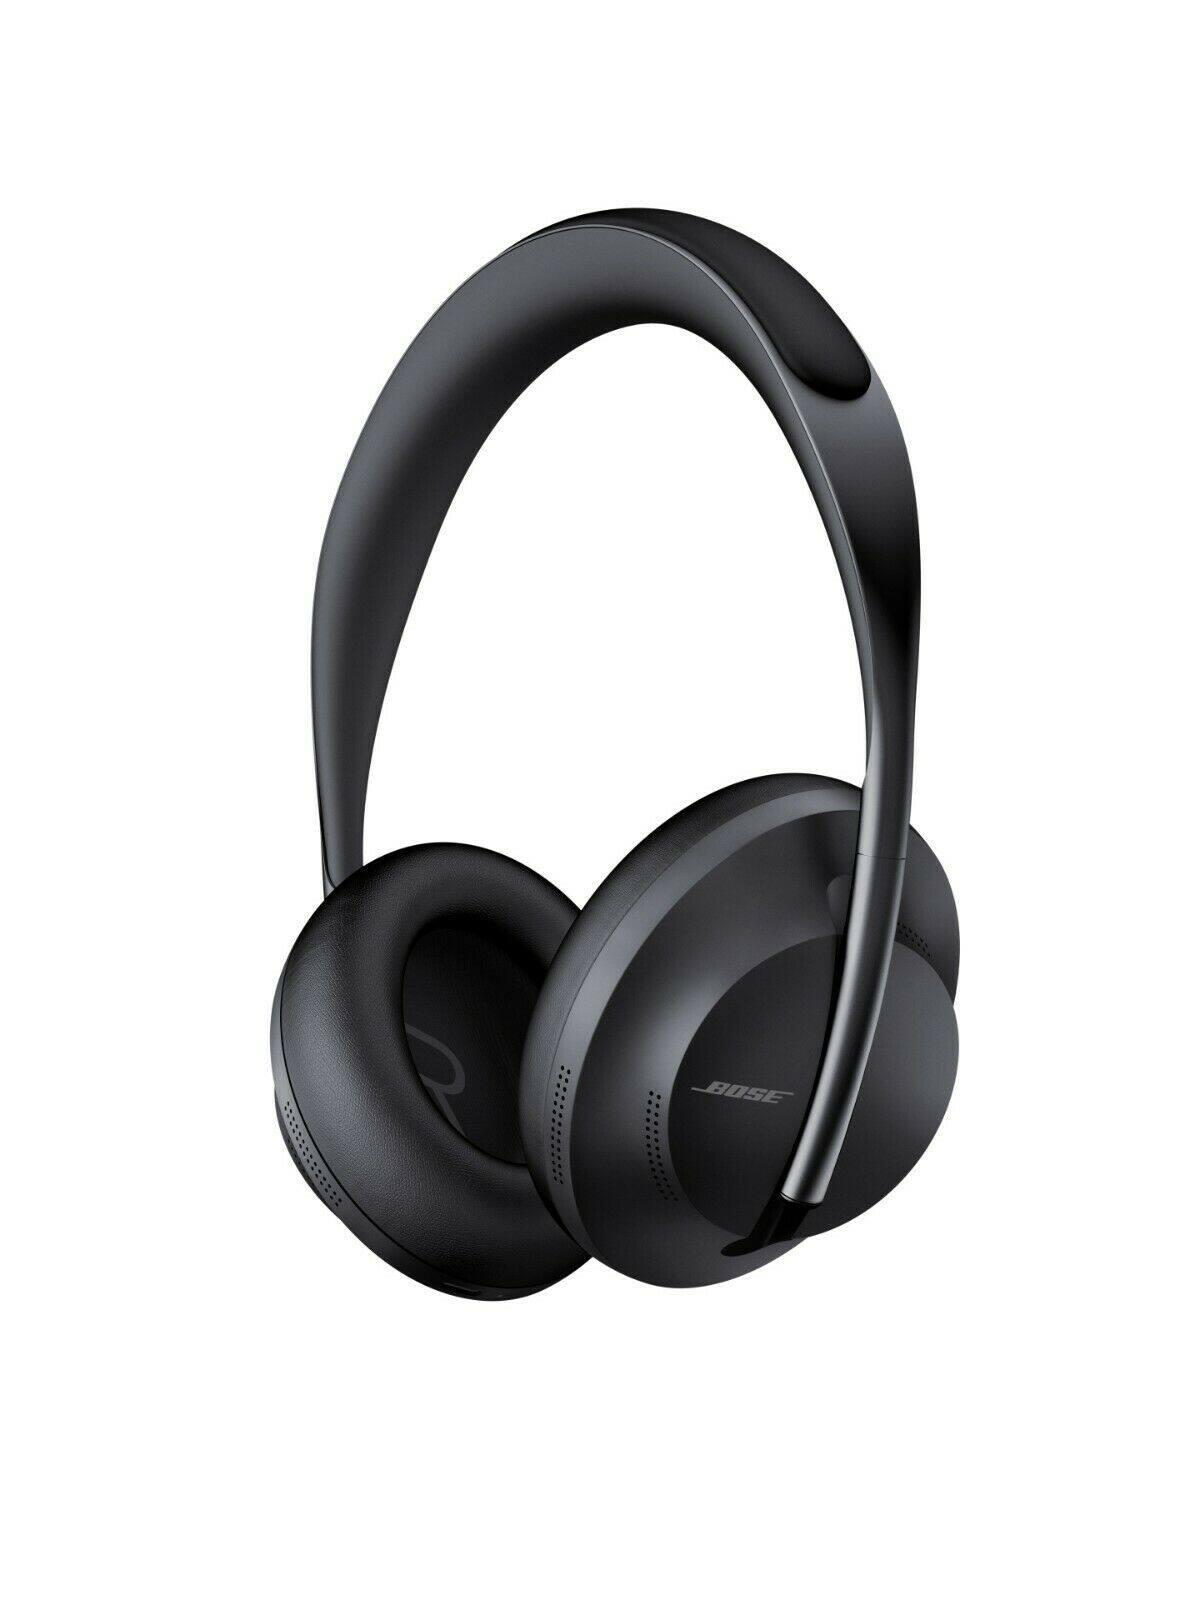 Bose Noise Cancelling 700 Headphones (Refurbished)